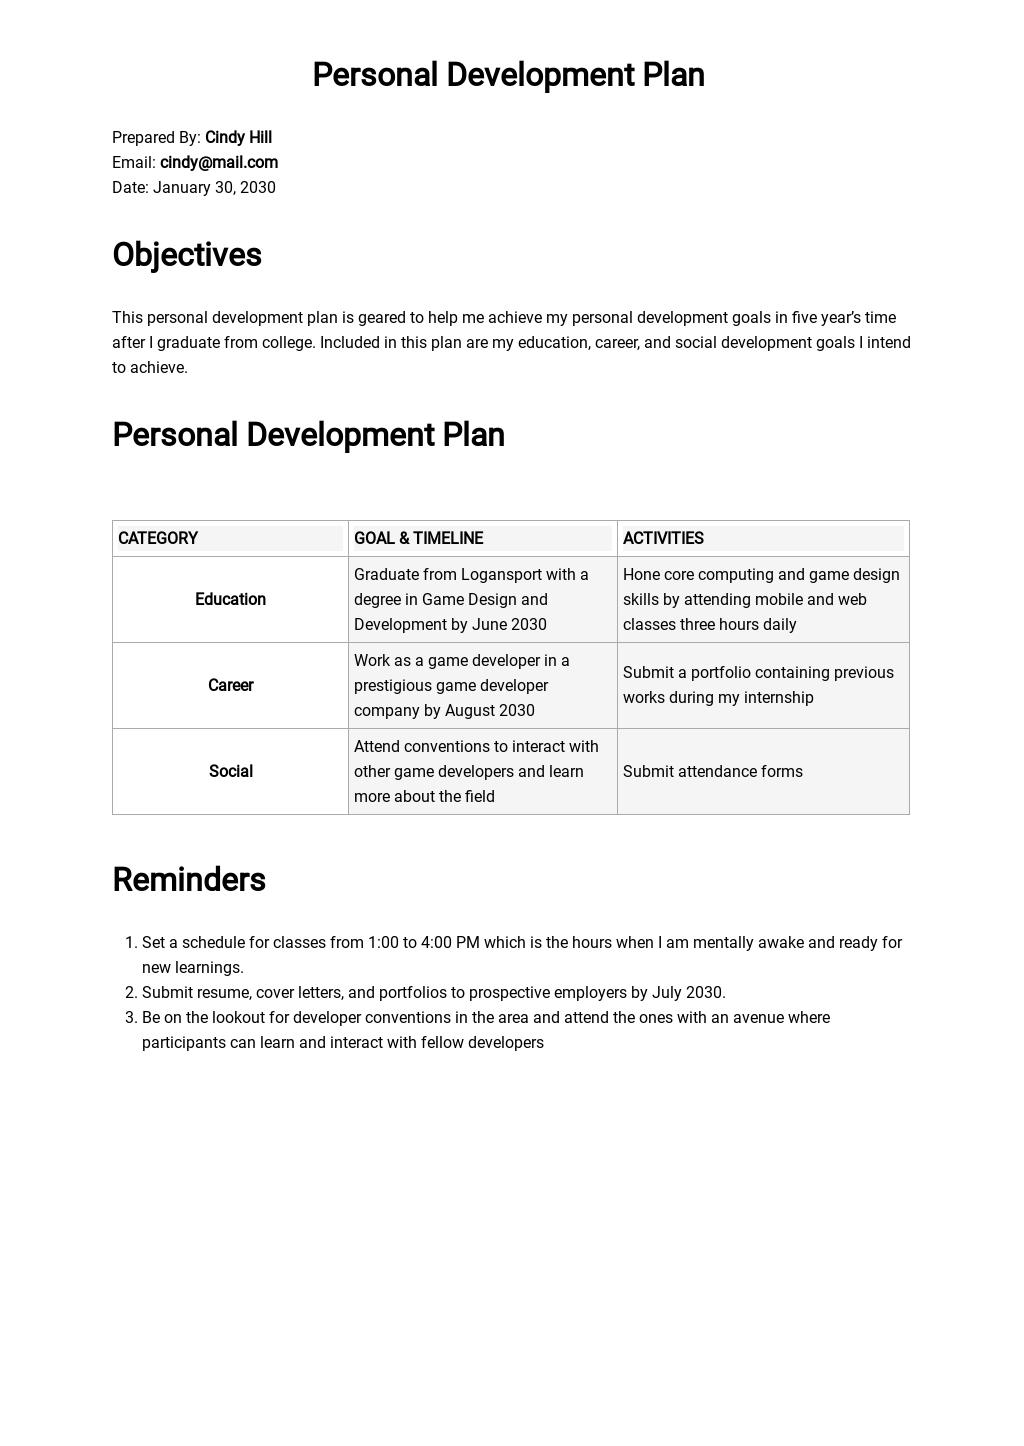 Personal Development Plan Template